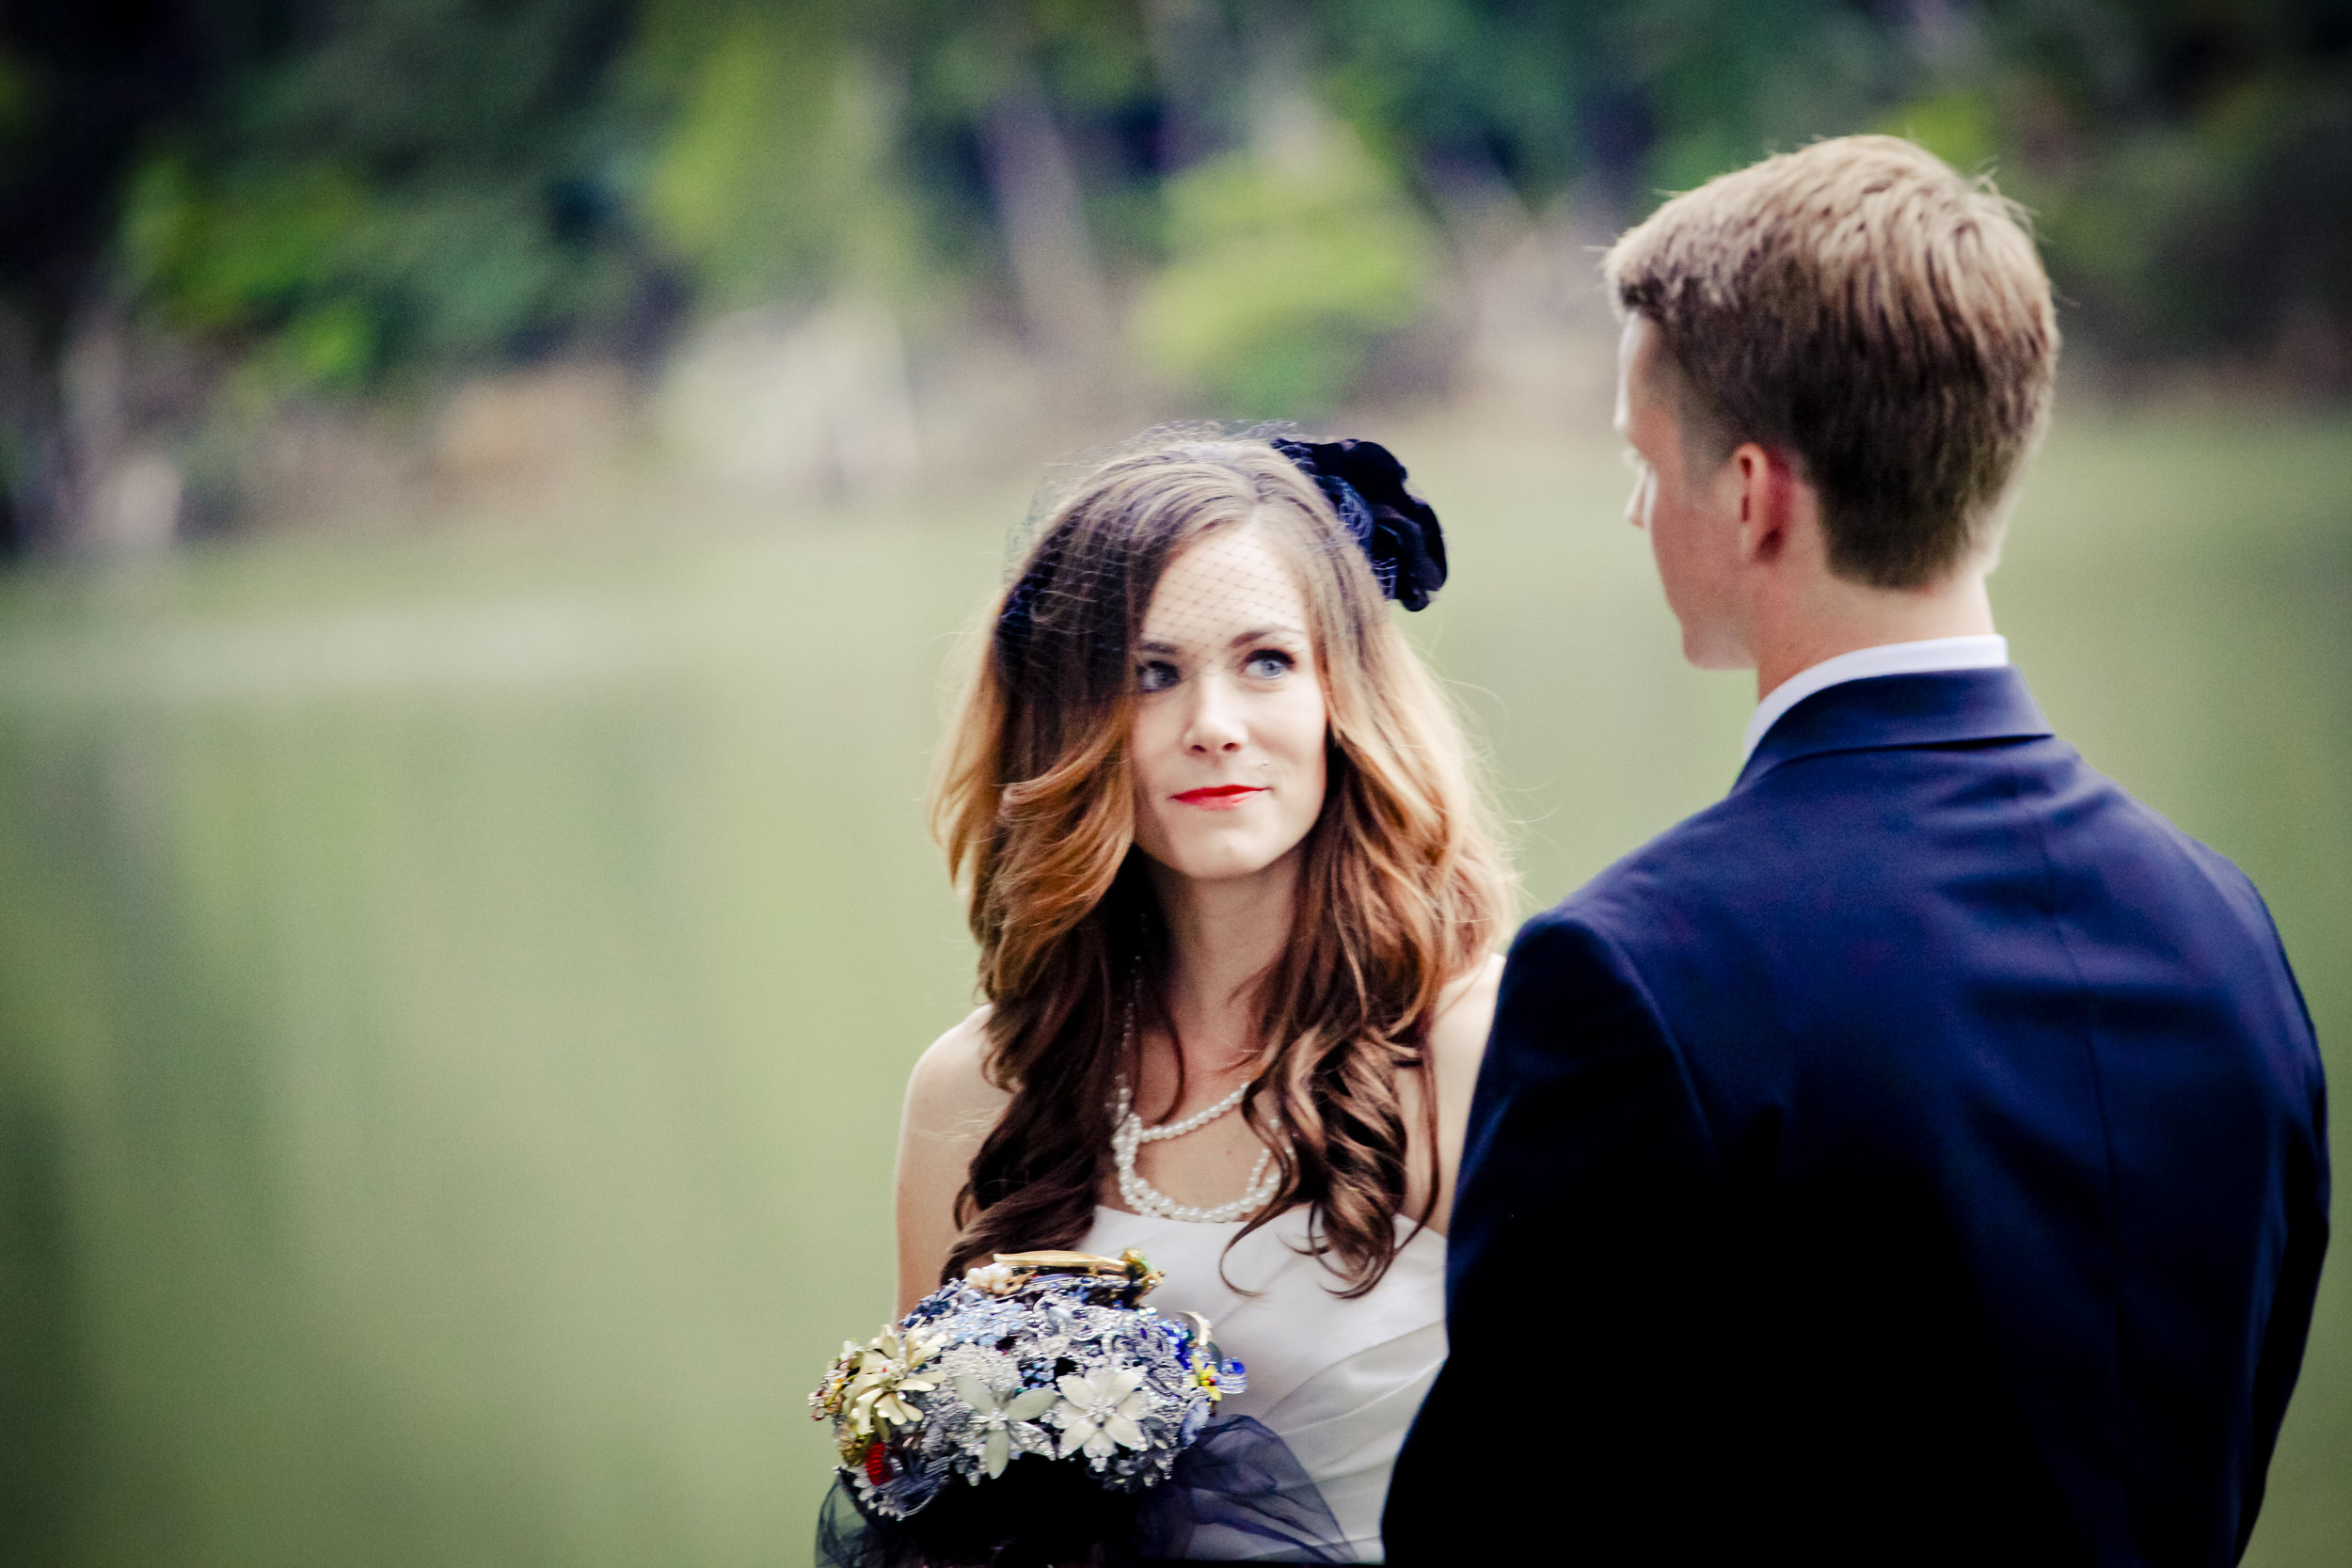 0015_100712 123 metcalf wedding edited.JPG